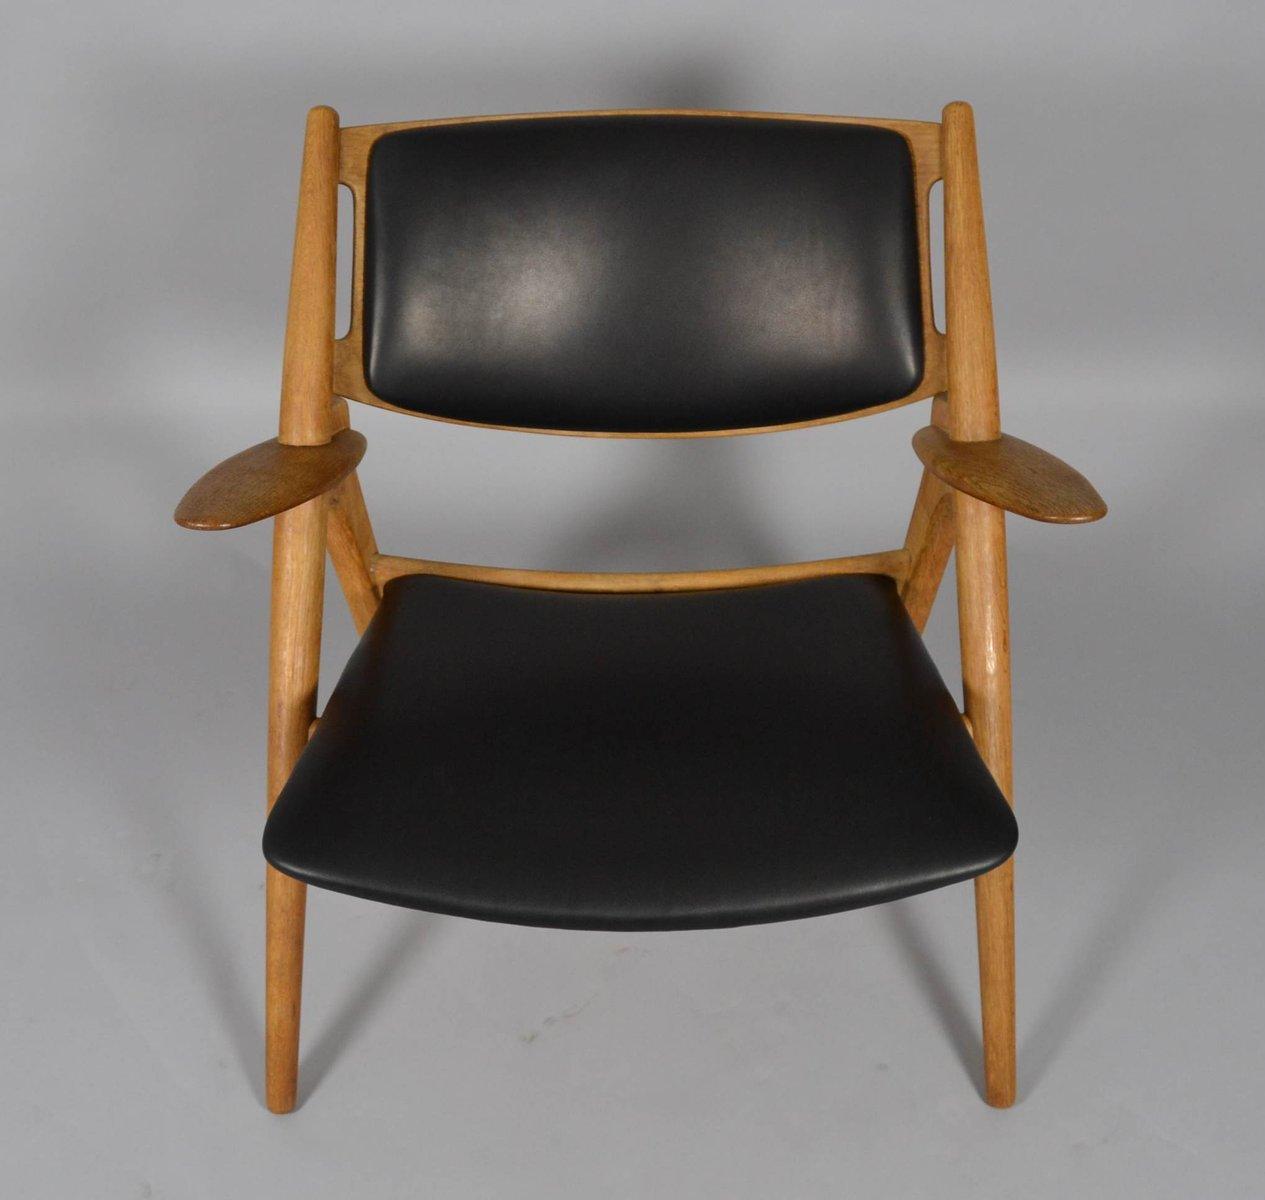 mid century ch28 sawbuck stuhl von hans j wegner f r carl. Black Bedroom Furniture Sets. Home Design Ideas